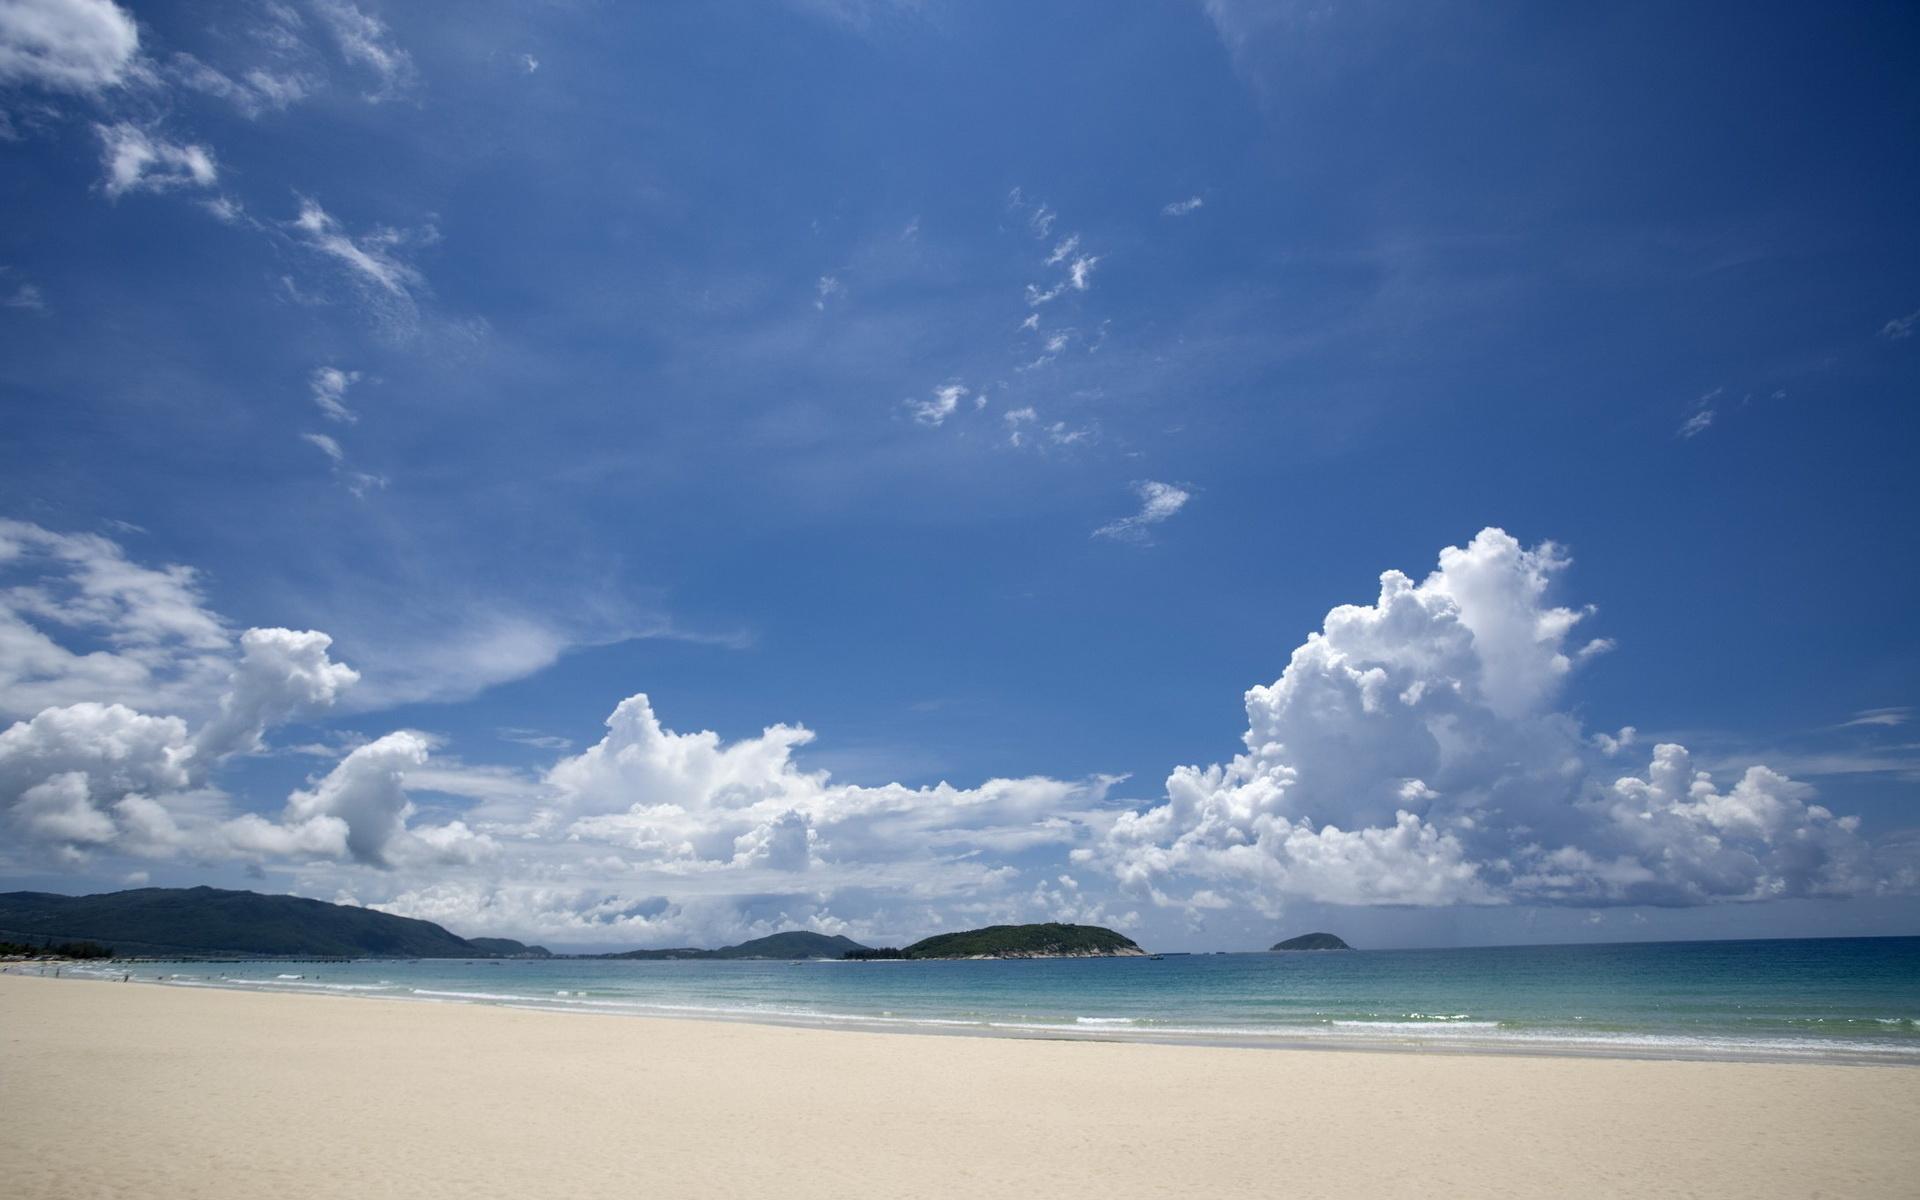 природа море горизонт небо облака пляж берег отдых nature sea horizon the sky clouds beach shore rest  № 821555 без смс